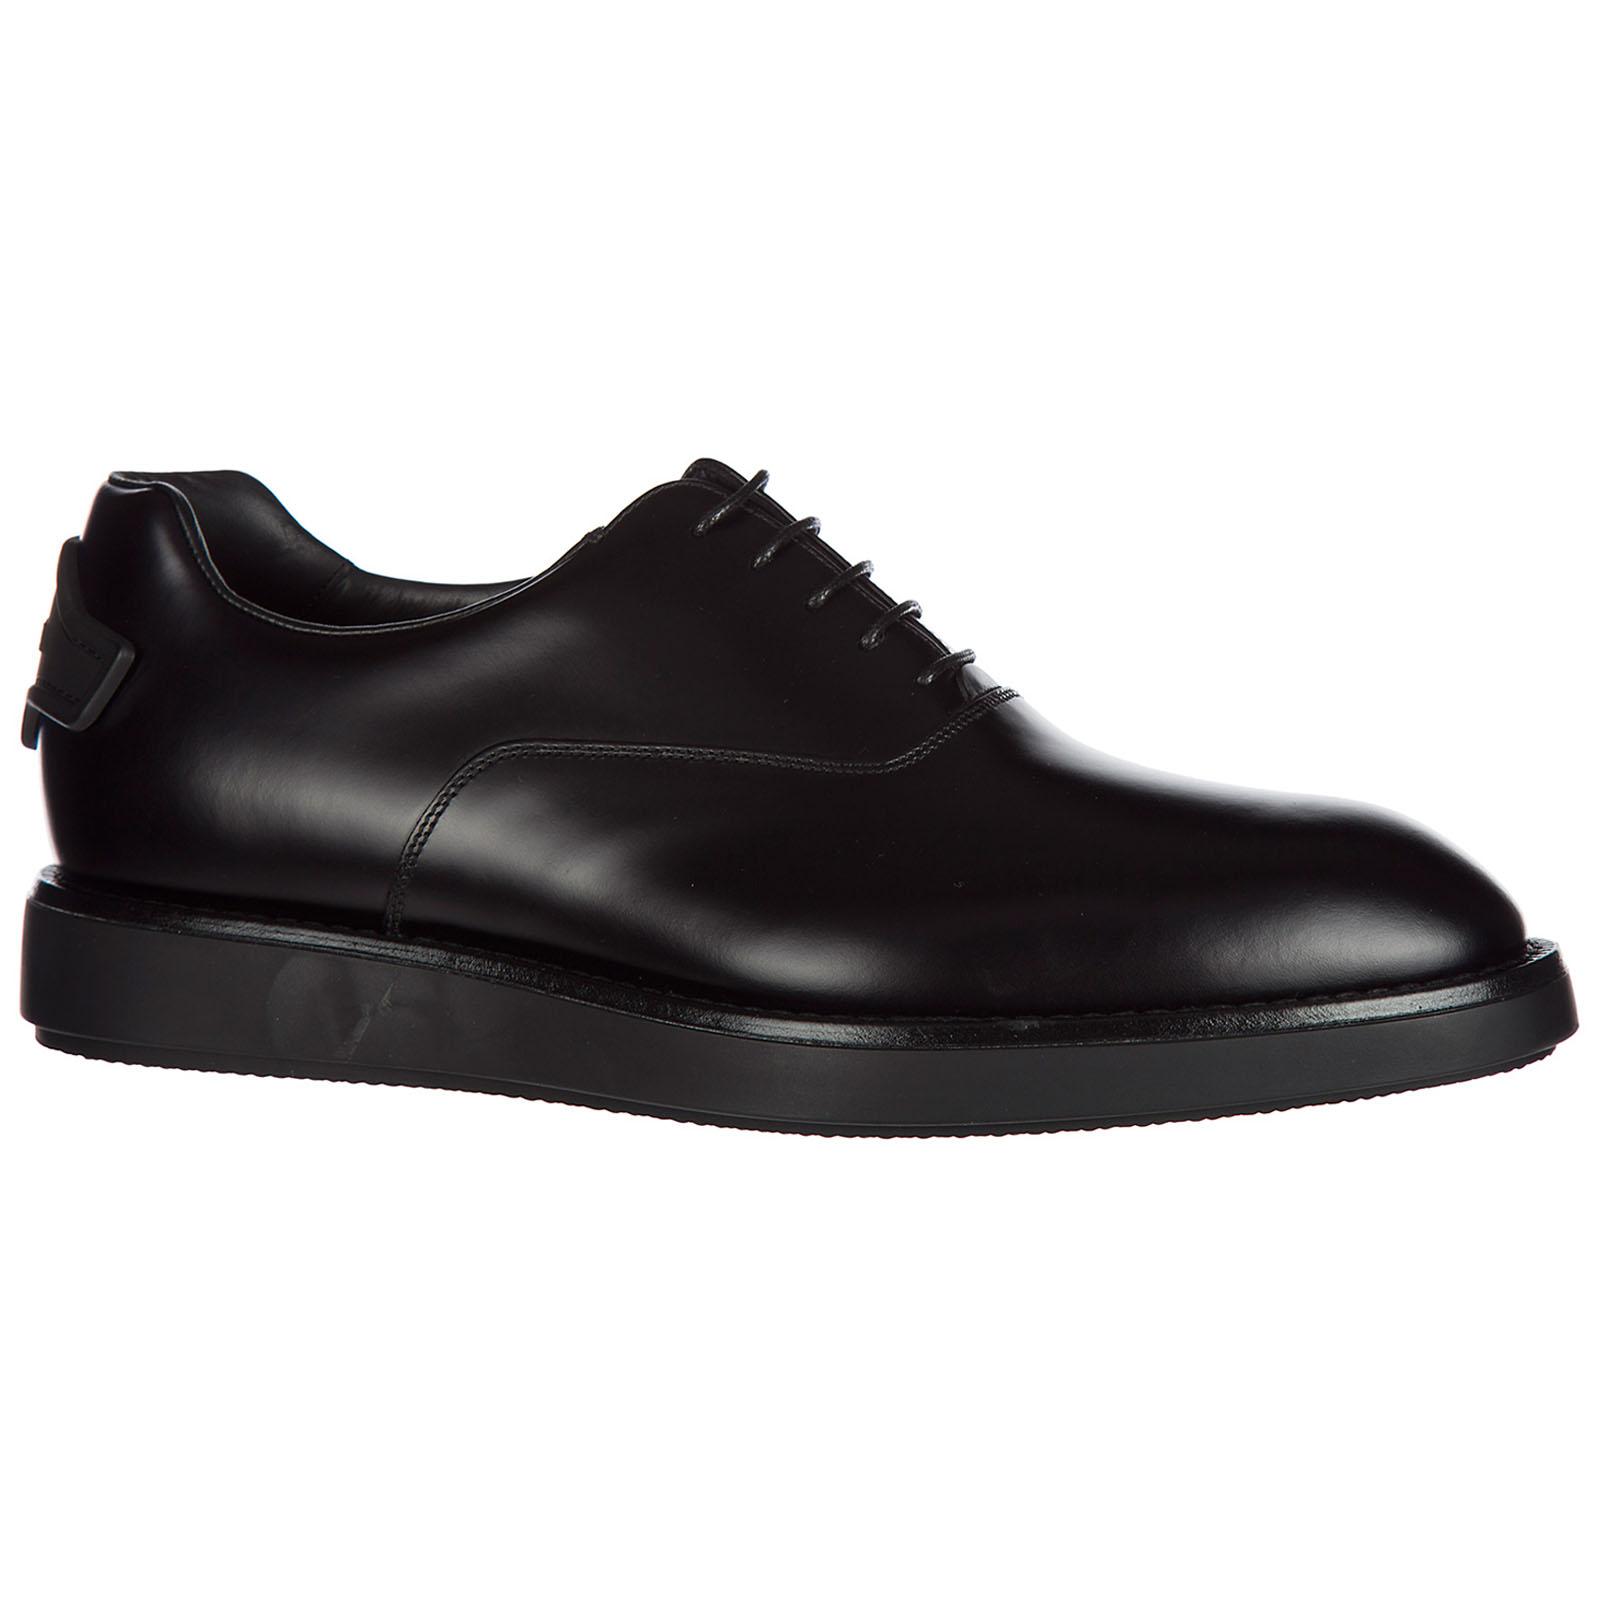 Lace-up shoes Prada 2EE25327B4LNERO